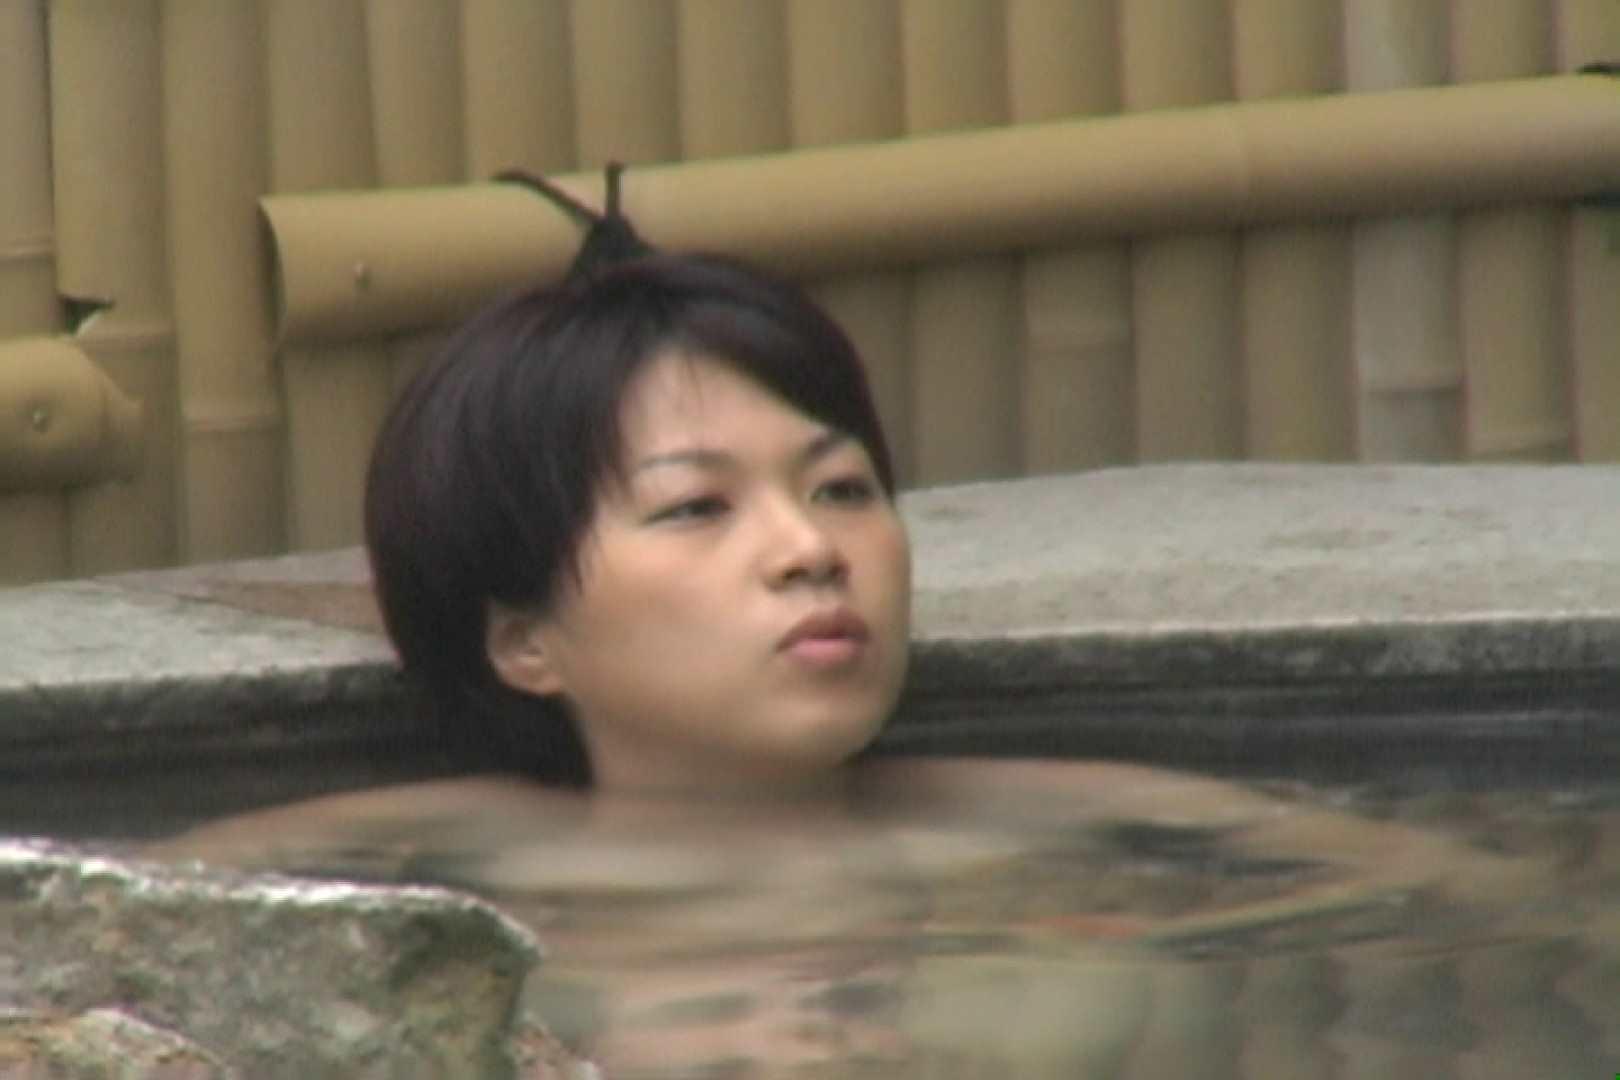 Aquaな露天風呂Vol.624 露天風呂編  88PIX 30